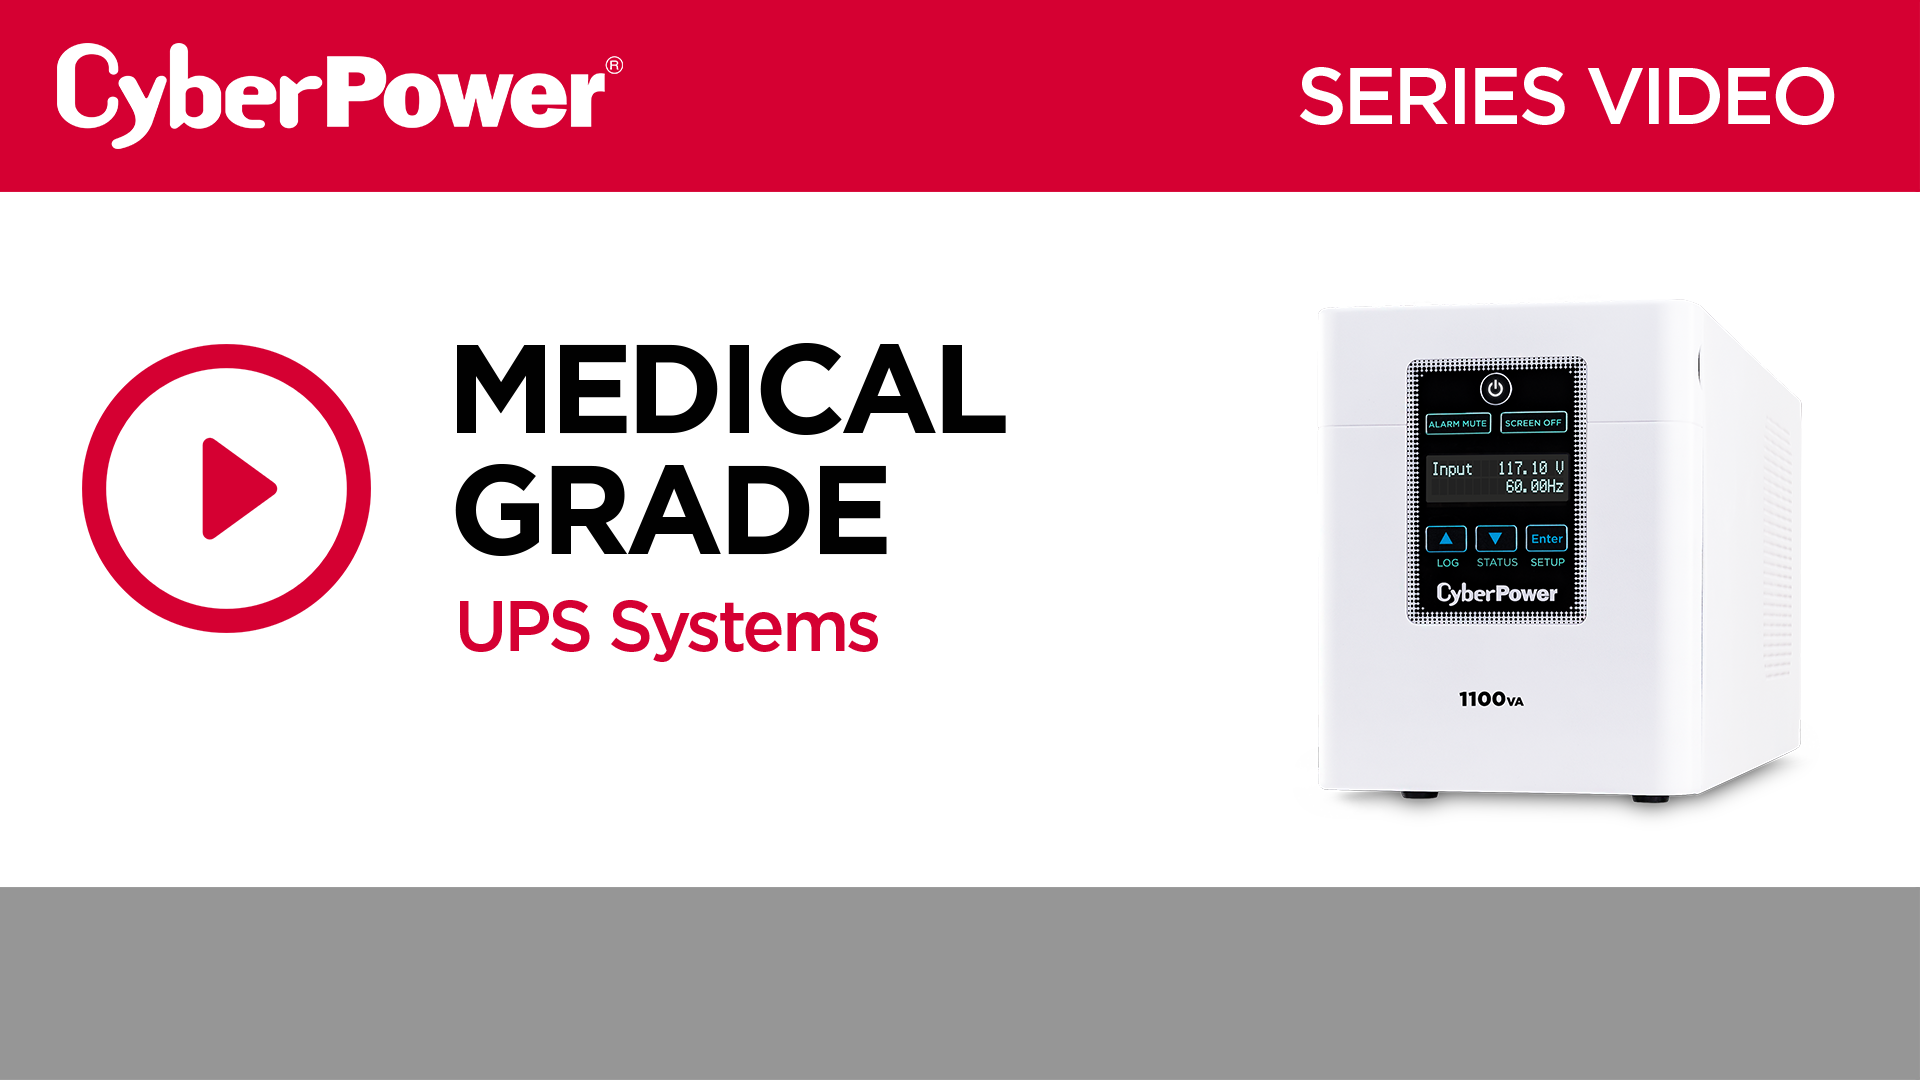 Hospital/Medical UPS Video